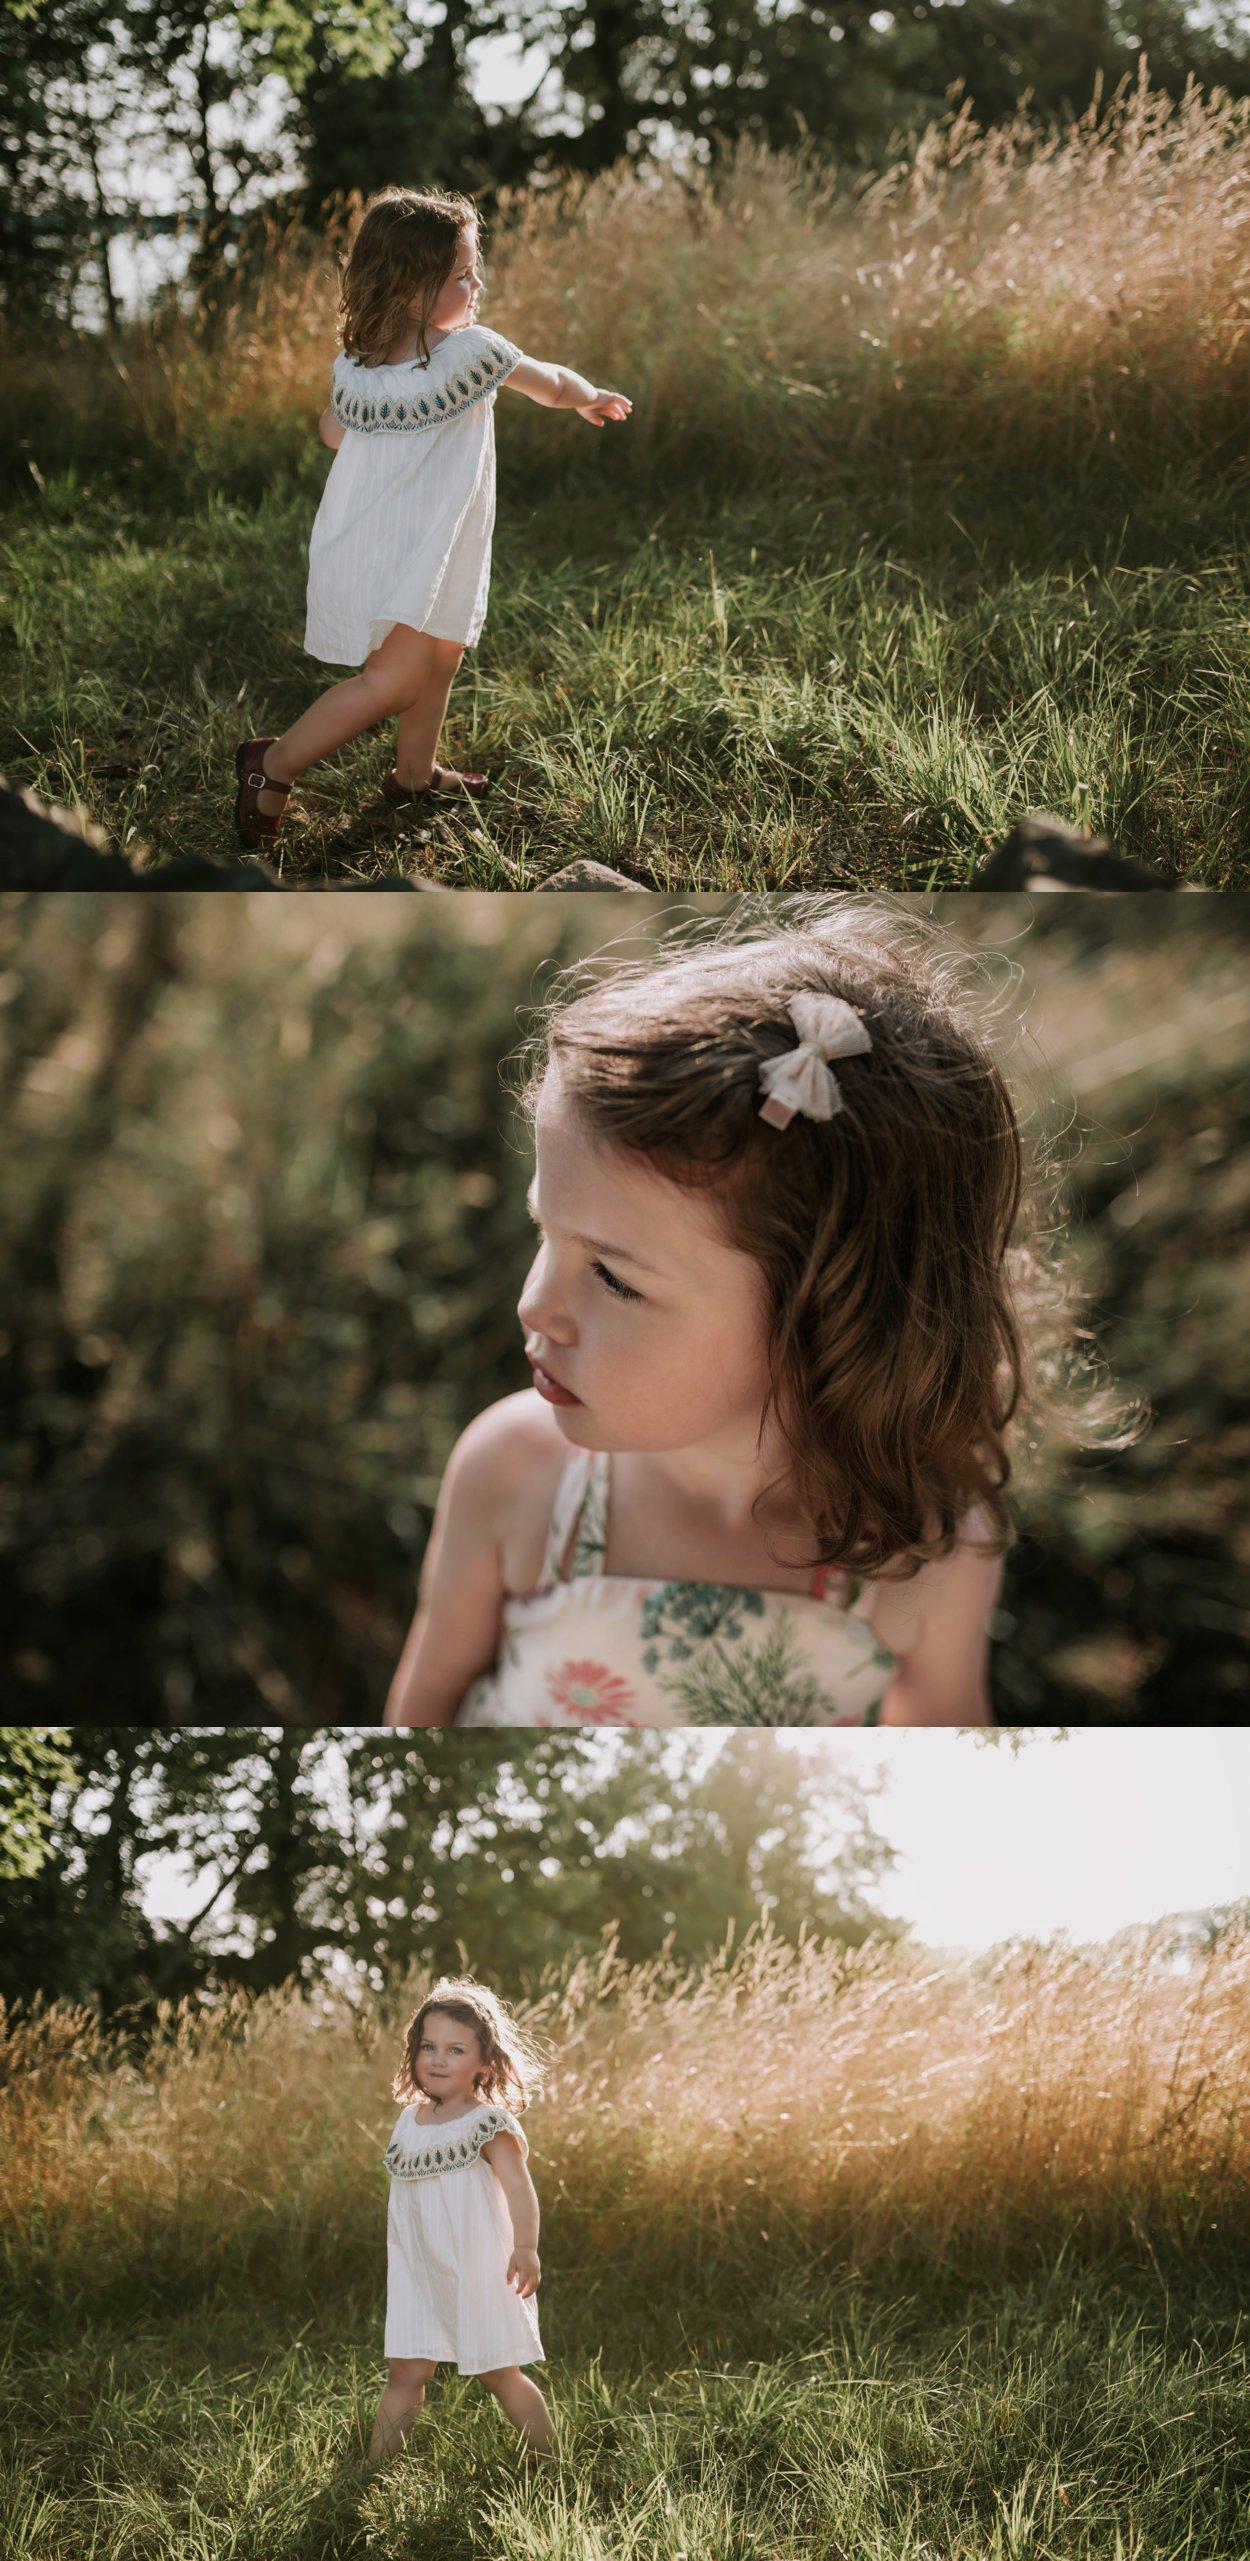 Summers_August_2018-184_Beautiful_Natural_Portraits_by_Award_Winning_Boston_Massachusetts_Family_Portrait_Photographer_Asher_and_Oak_Photography.jpg